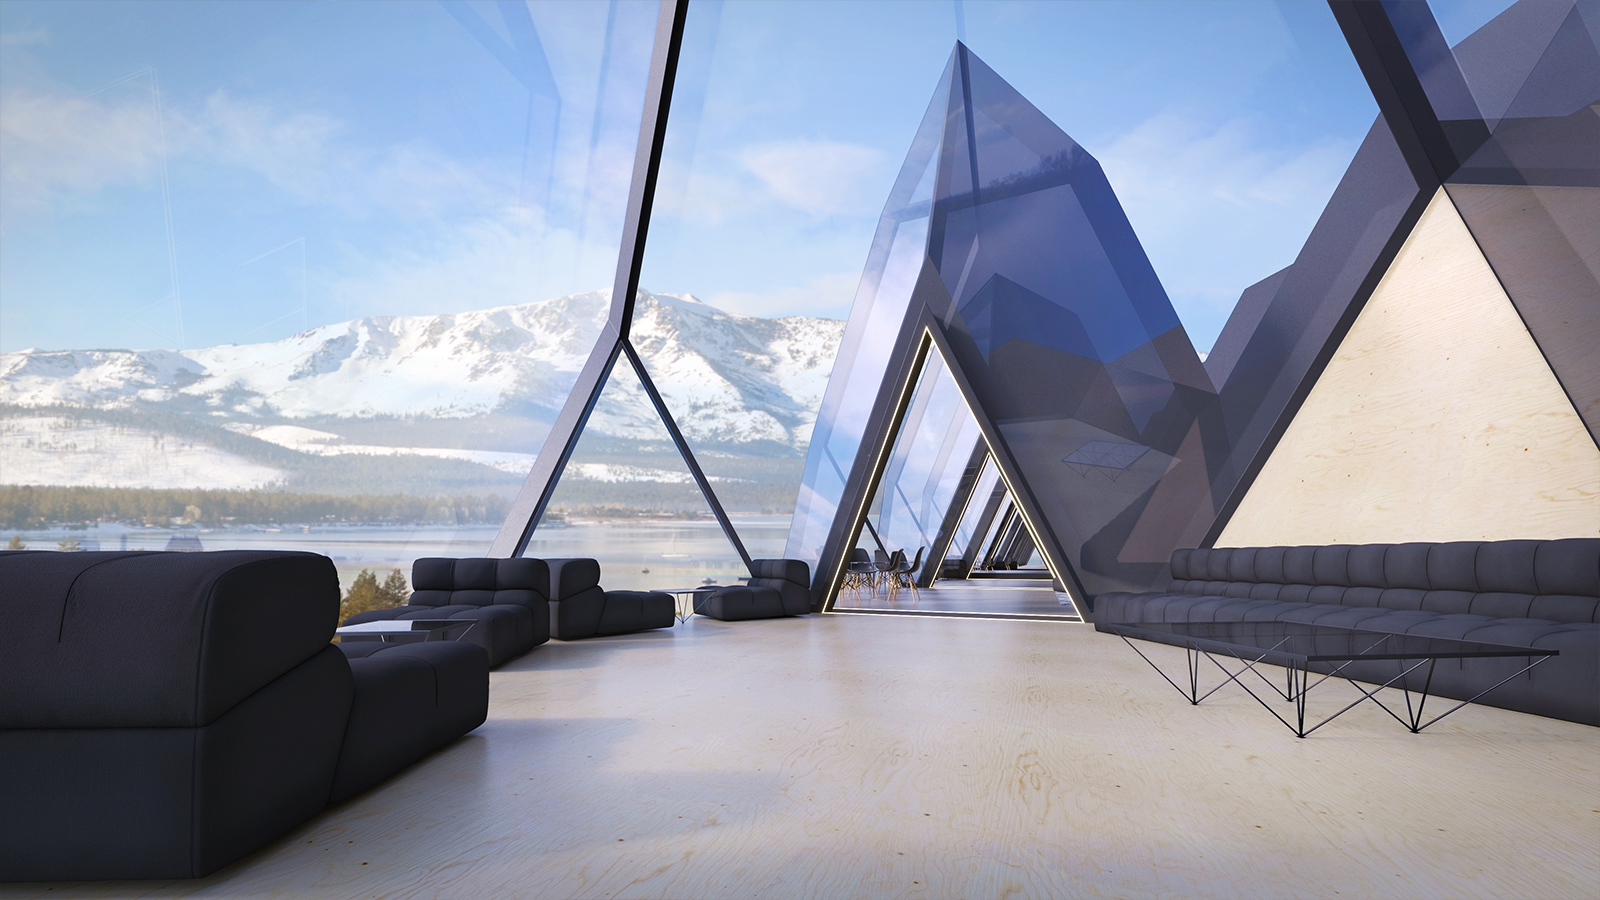 Tetra Hotel futurista interior